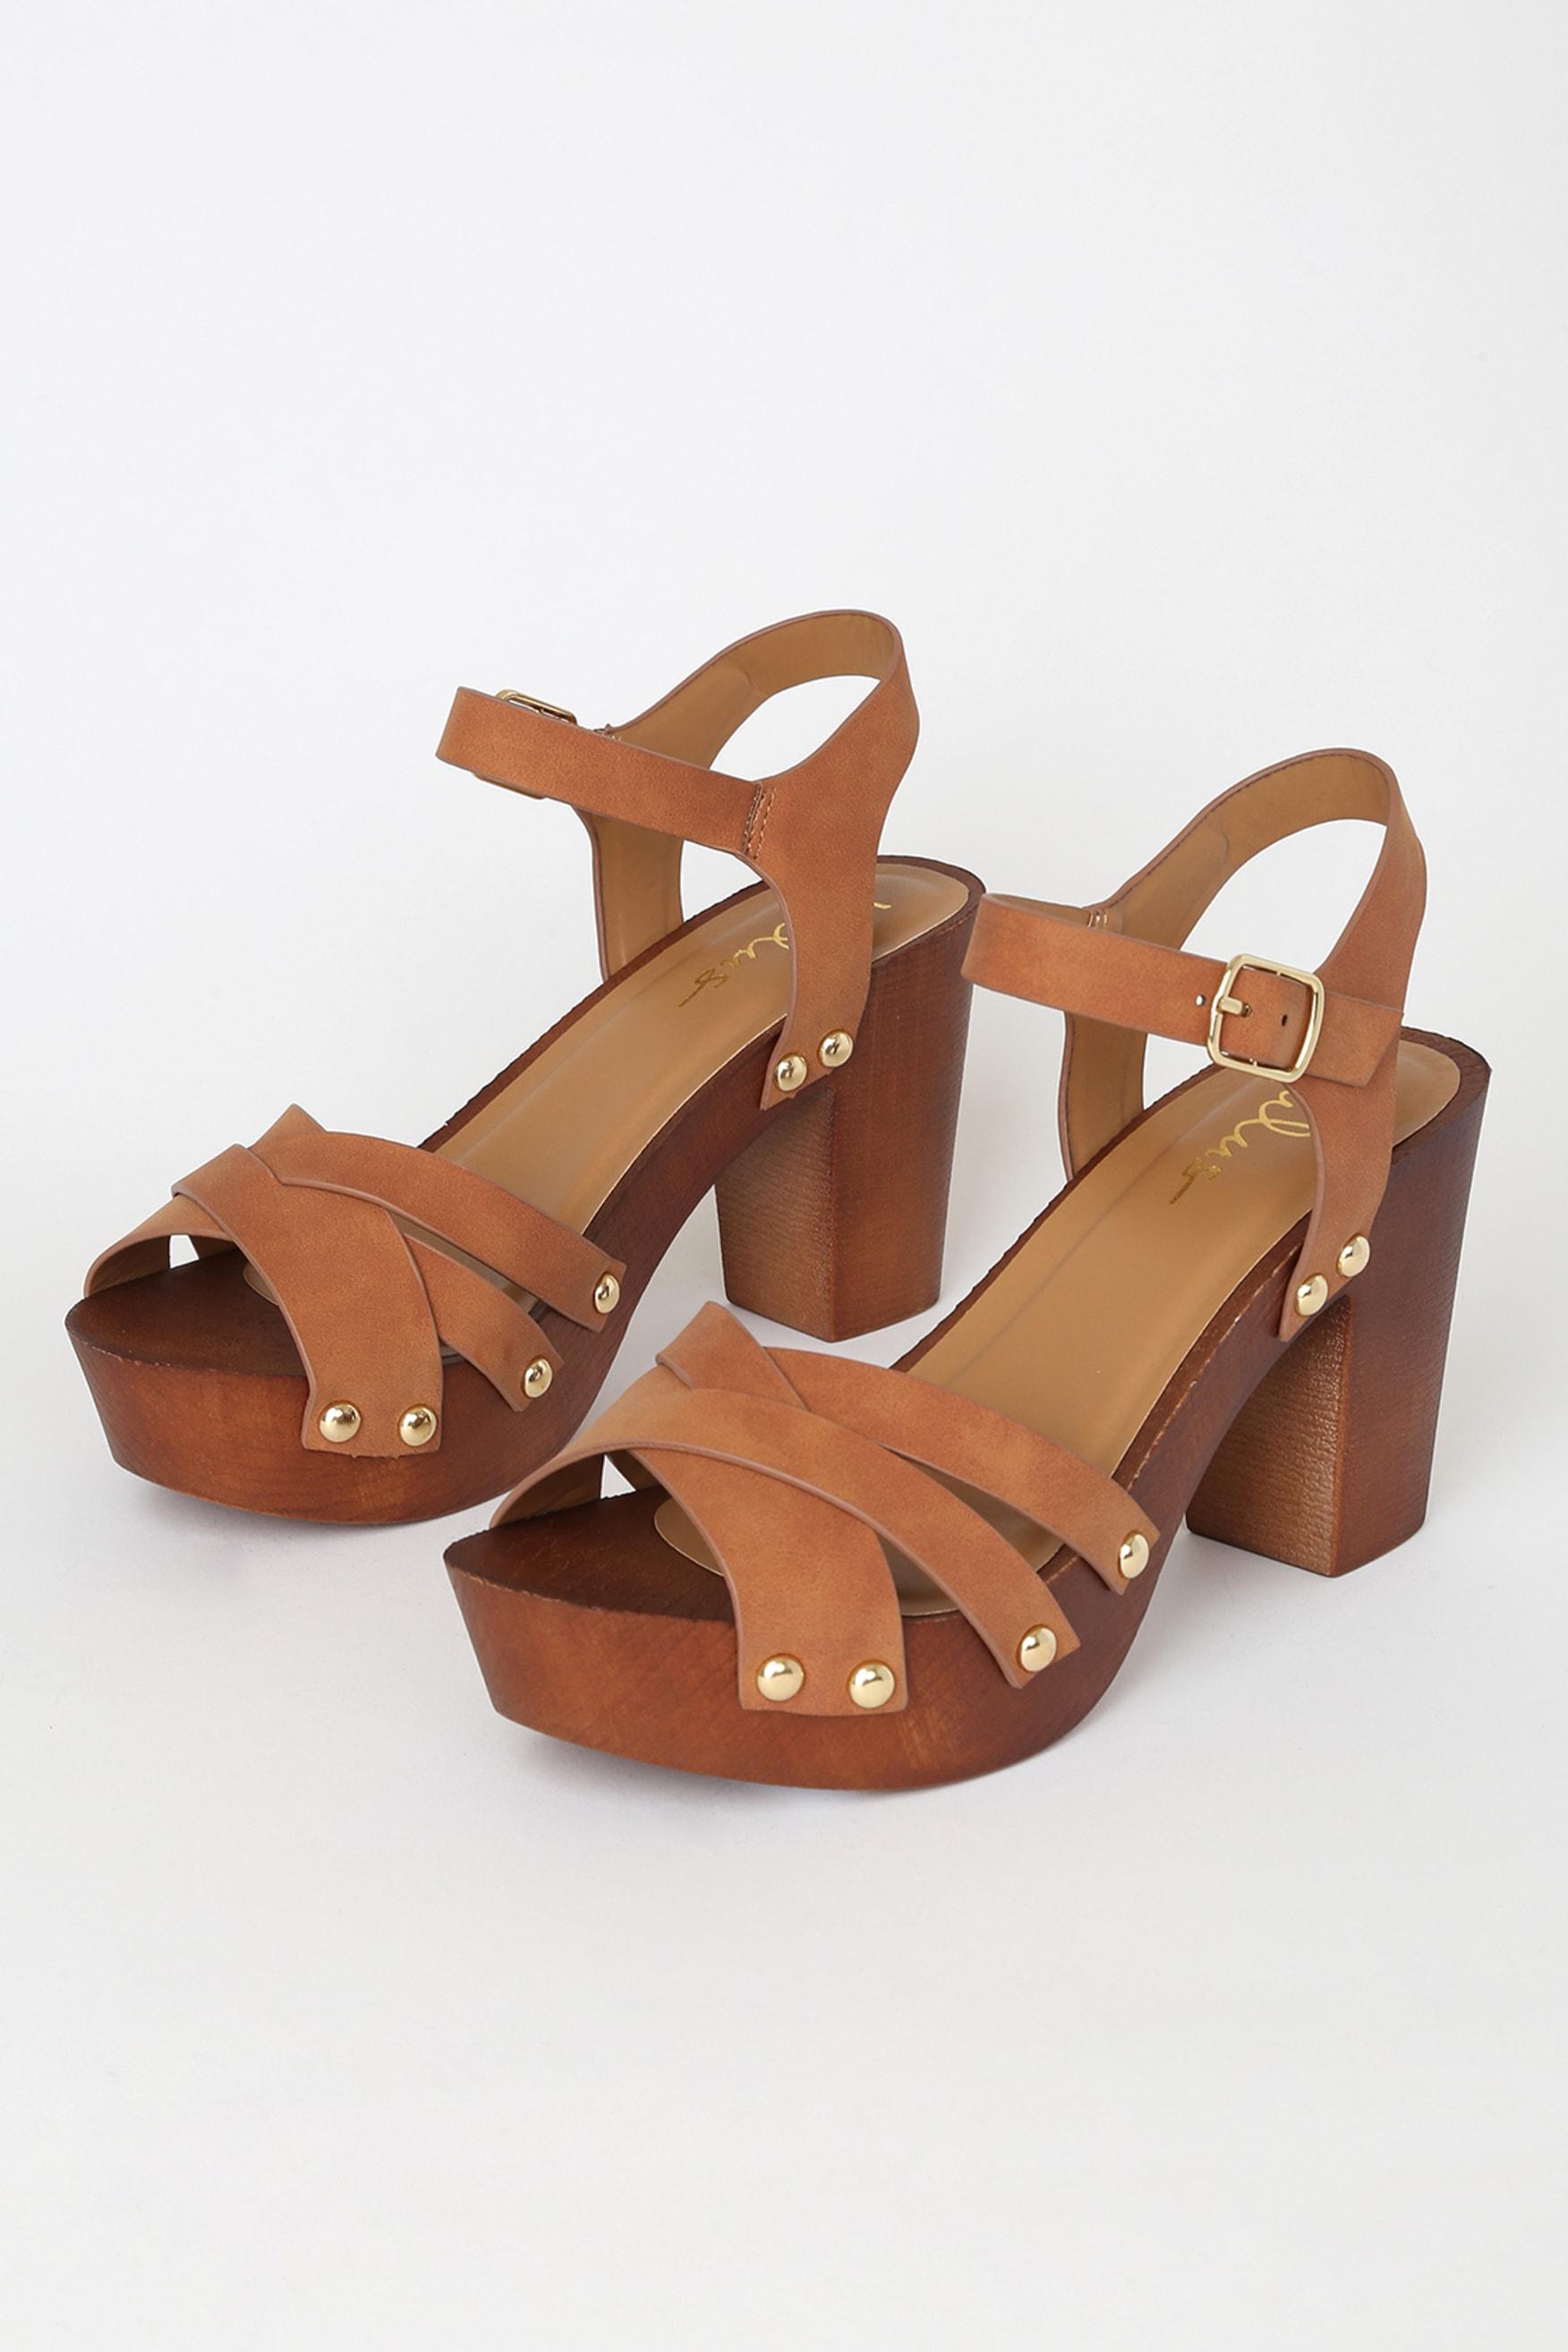 Tan Platform Heels